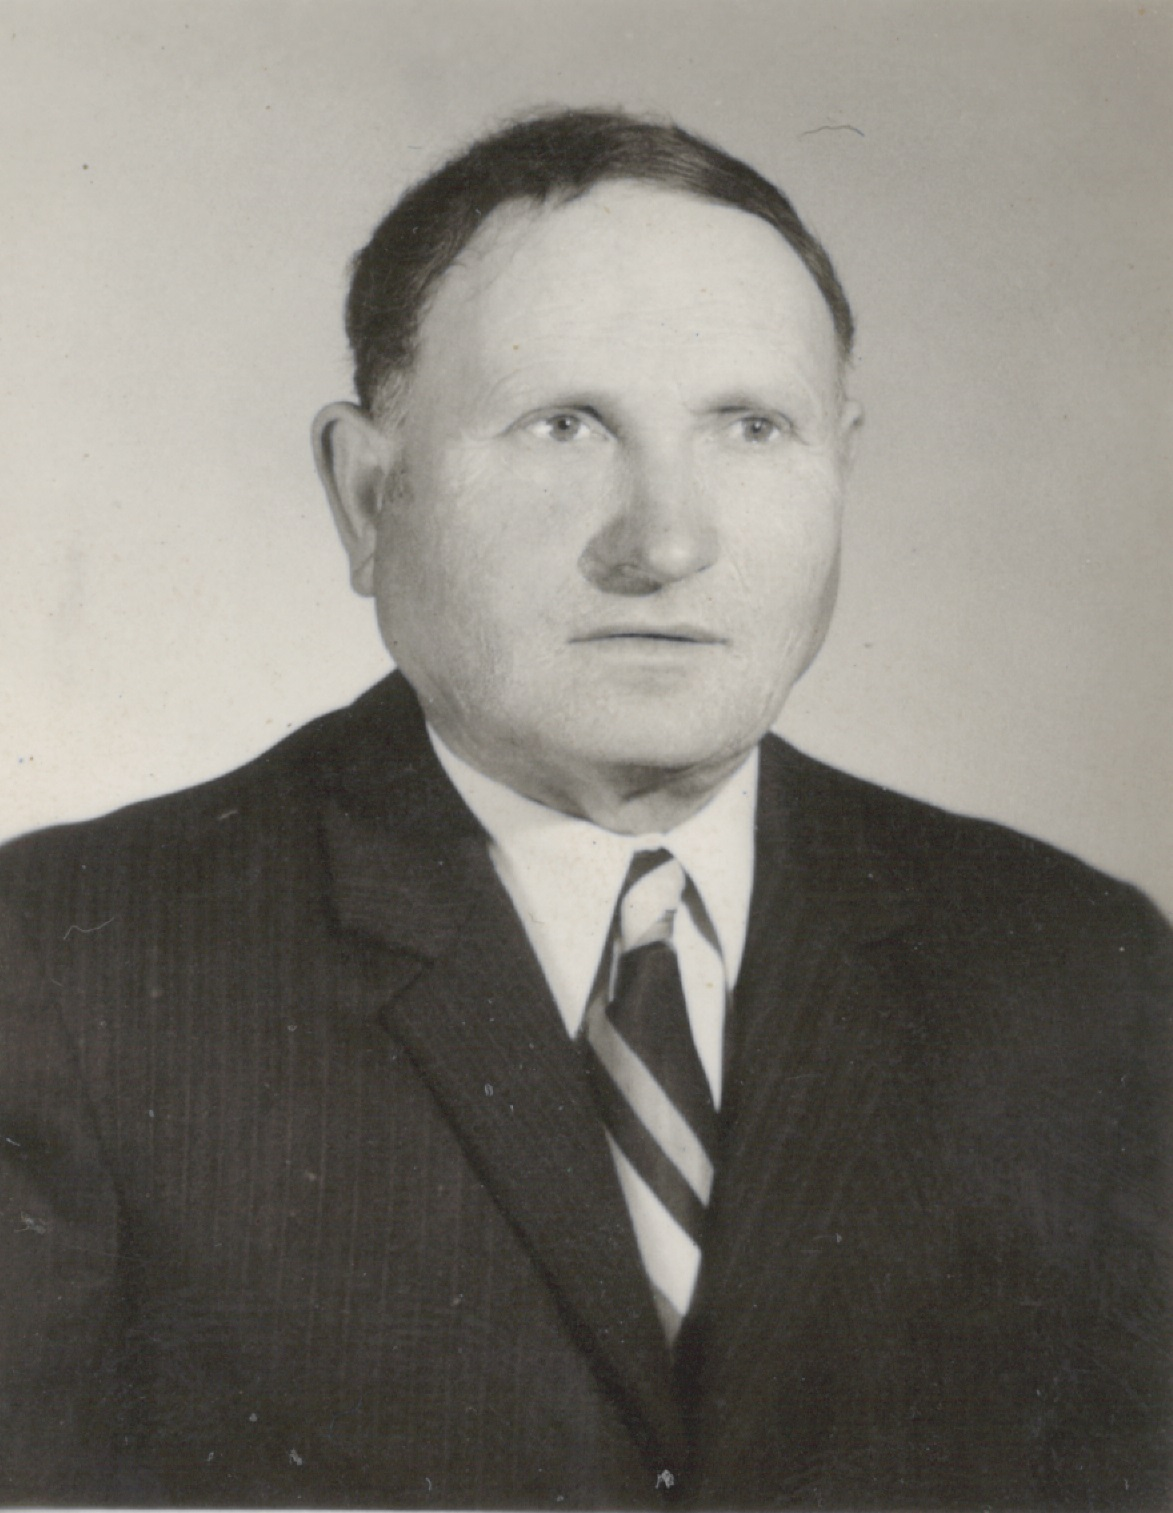 José Ramos Martins